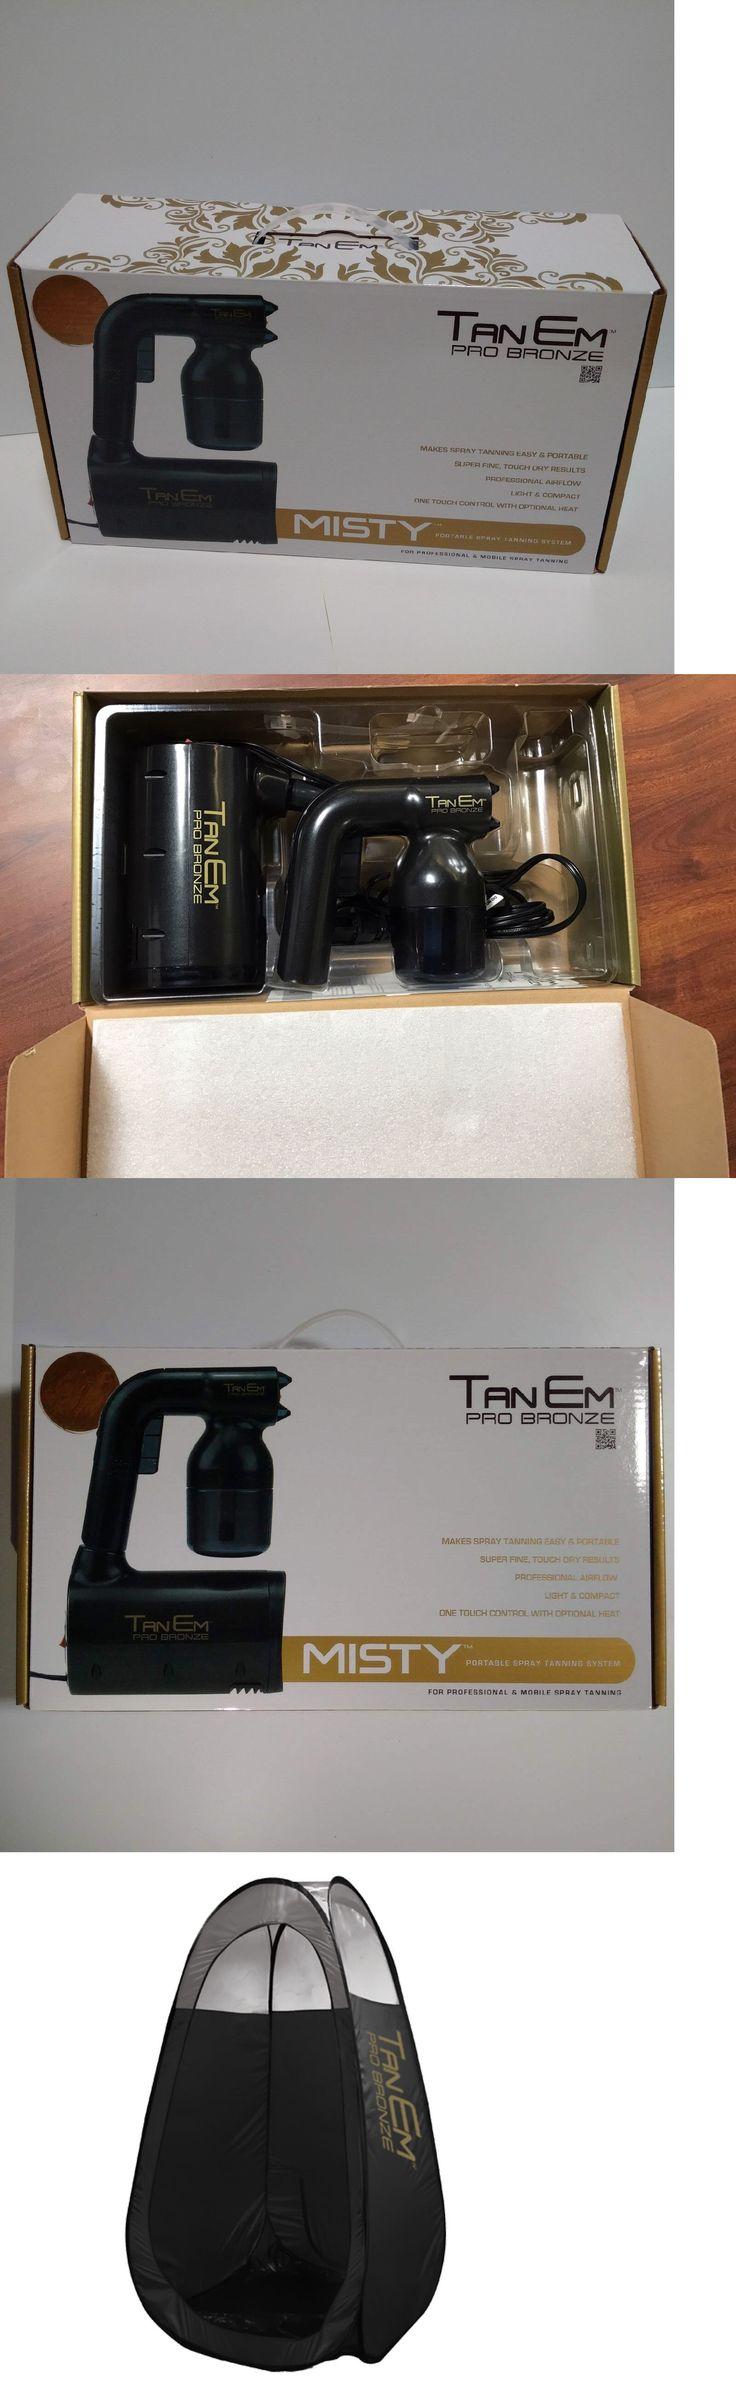 Airbrush Compressors and Guns: Tanem Pro Bronze Misty Portable Tanning Machine Handheld Spray Gun Tan Tent Kit BUY IT NOW ONLY: $199.95